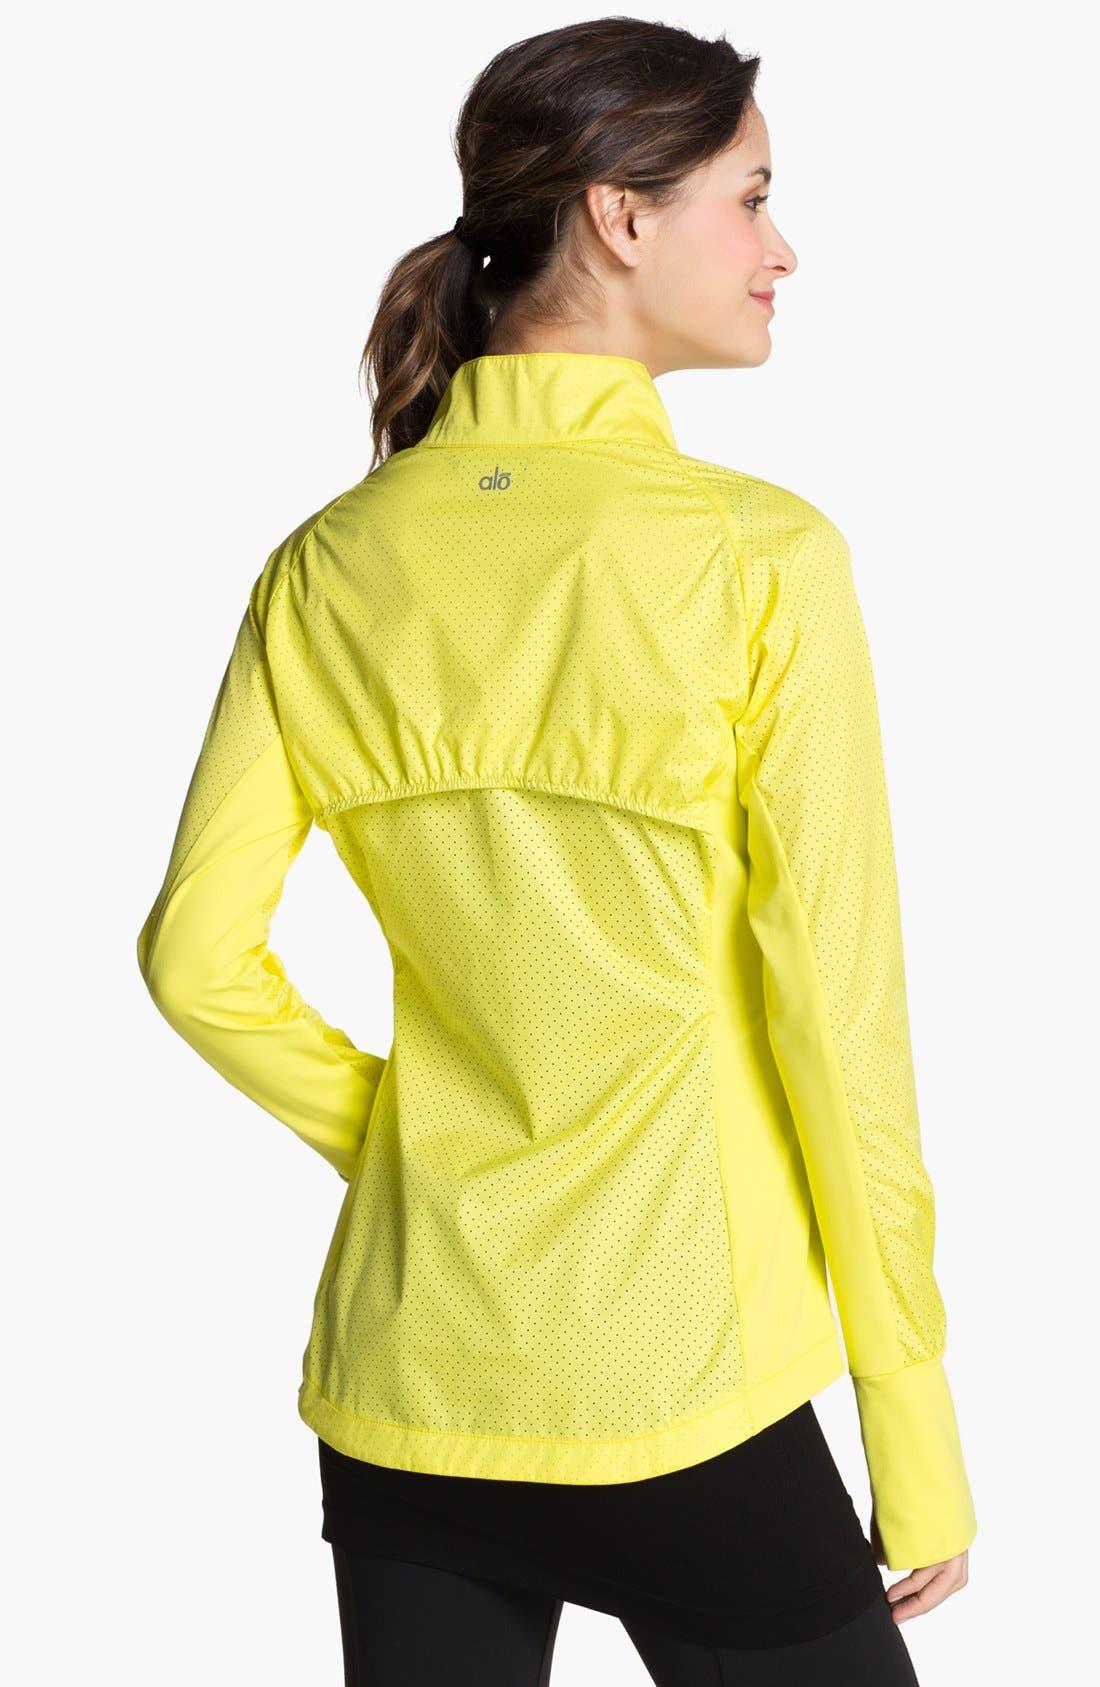 Alternate Image 2  - Alo 'Precision' Taffeta Running Jacket